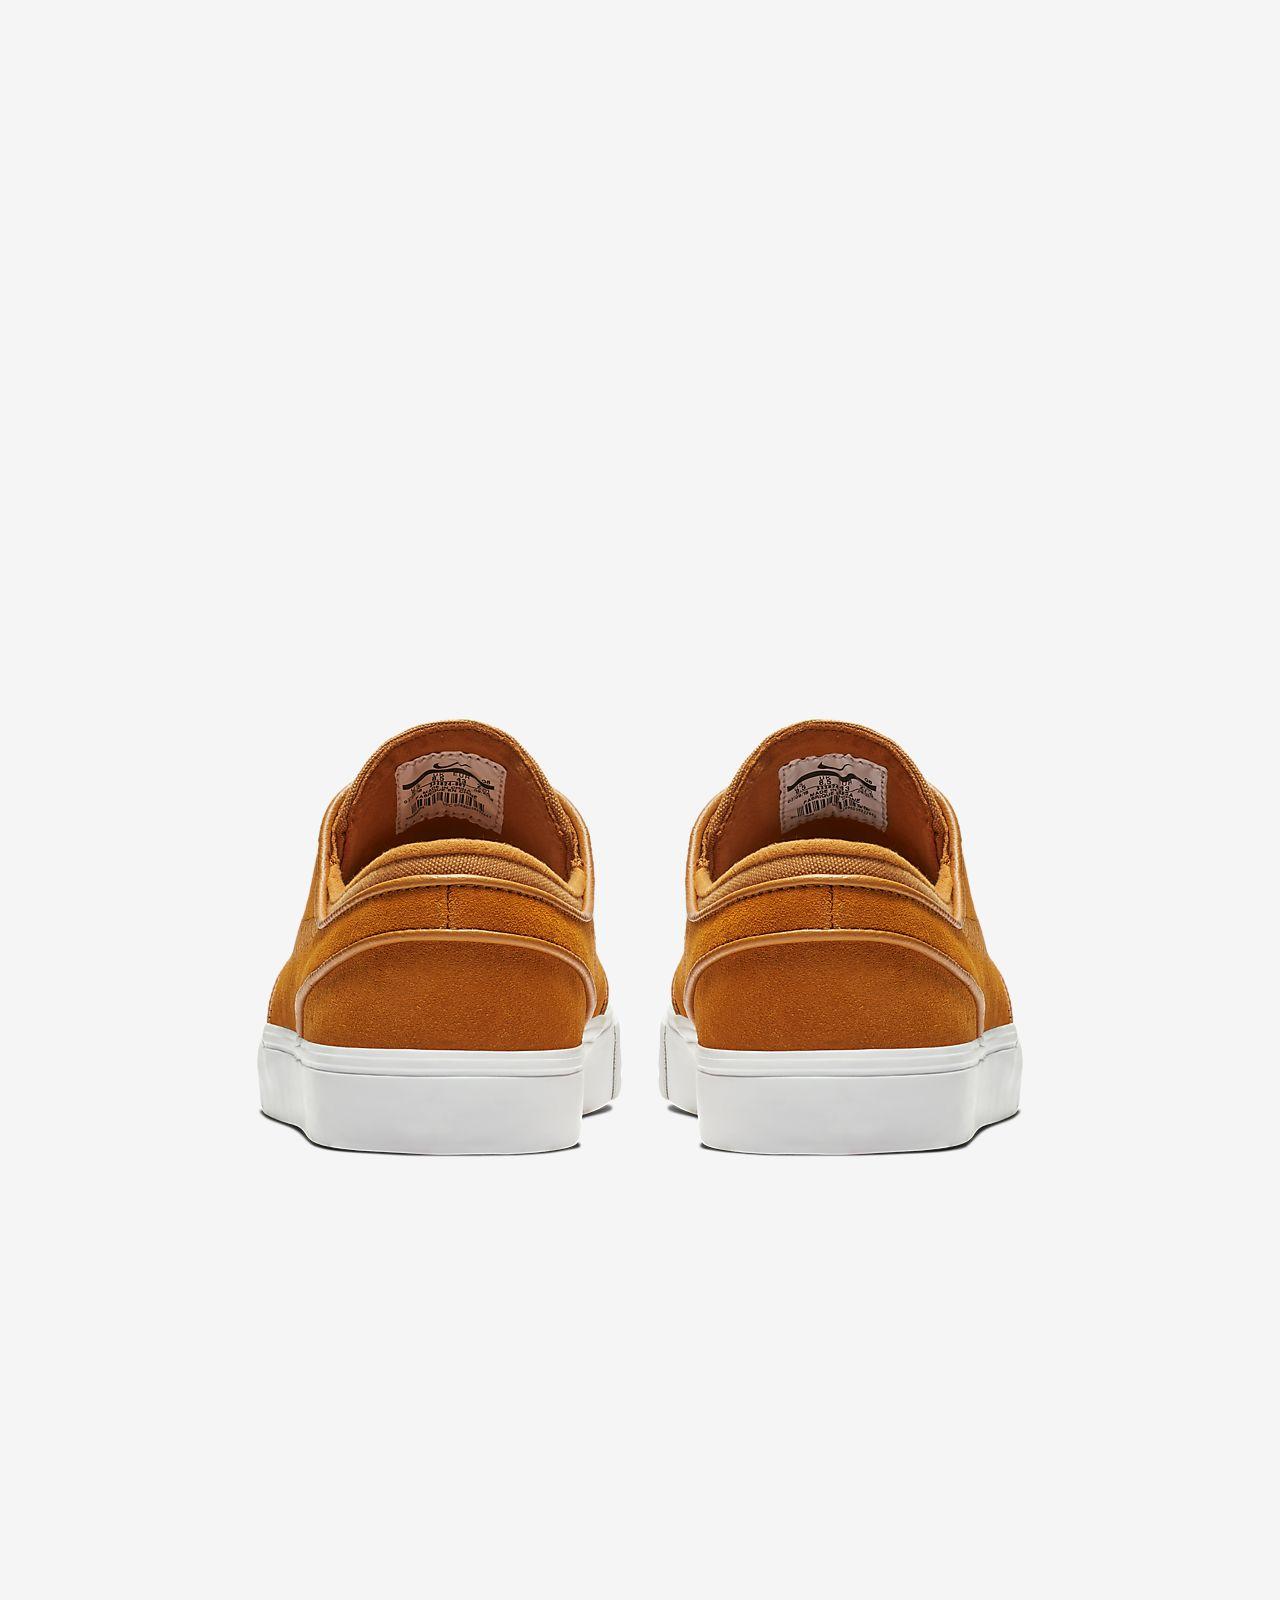 1484e566446cef Nike Zoom Stefan Janoski Men s Skate Shoe. Nike.com